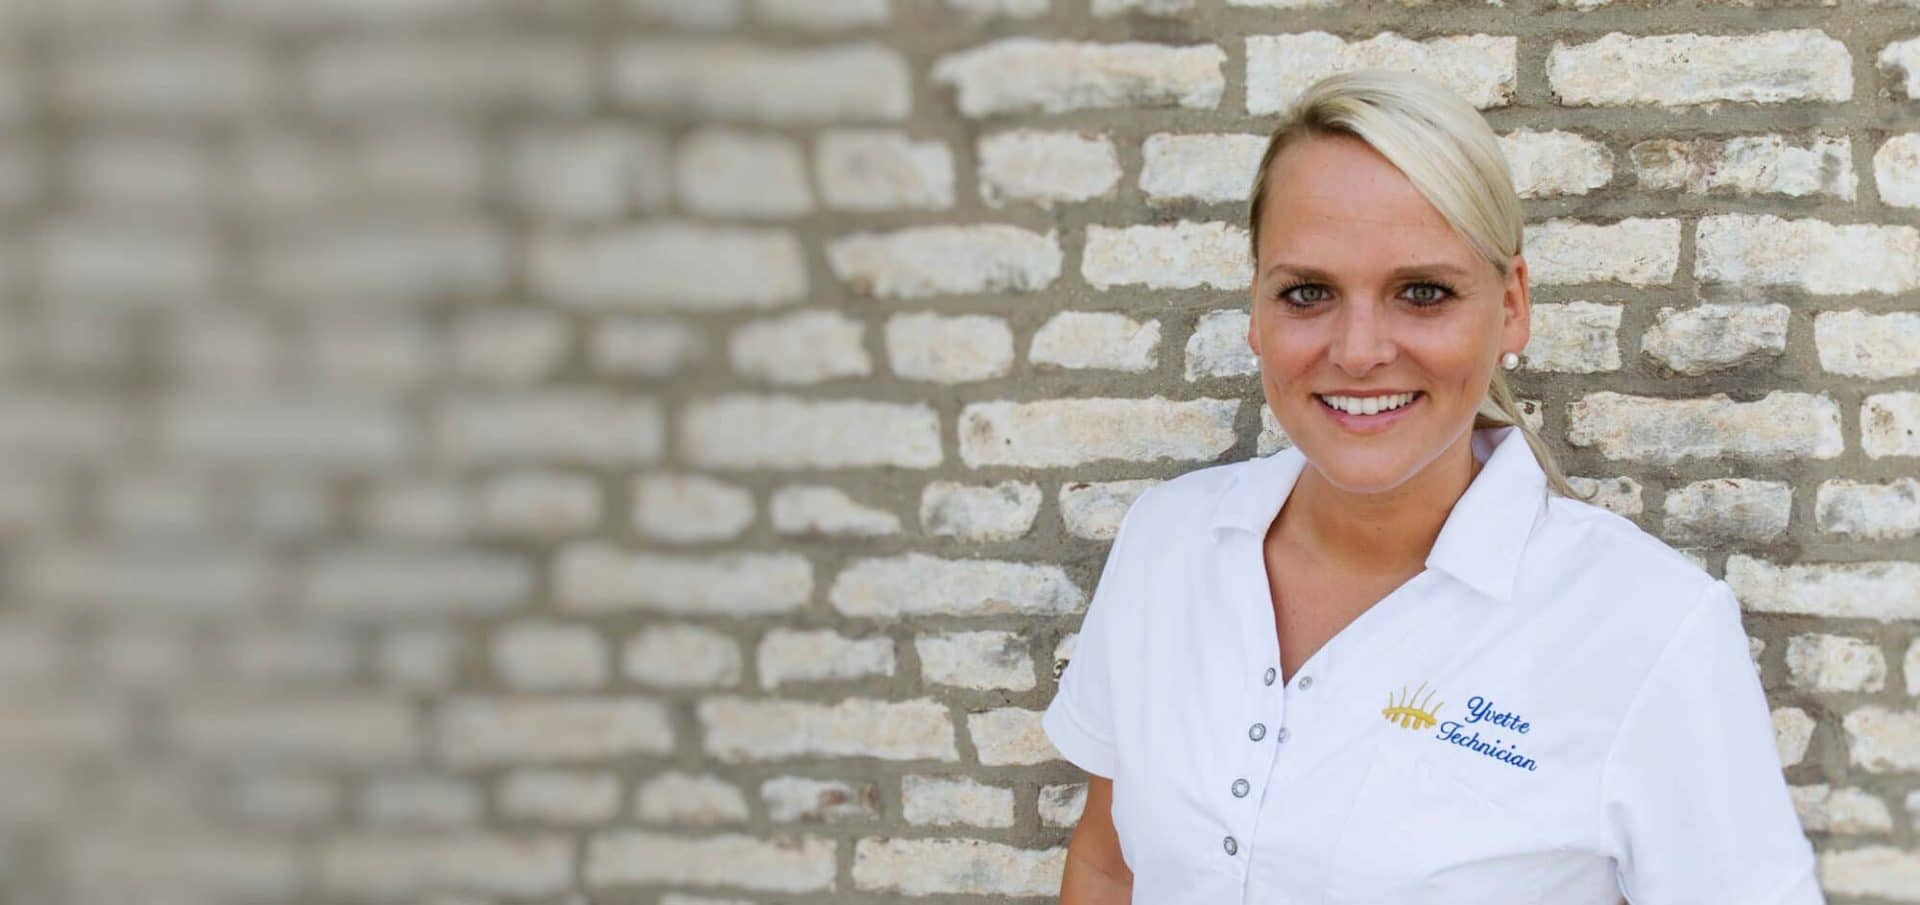 Technician Yvette Hair Science Maastricht